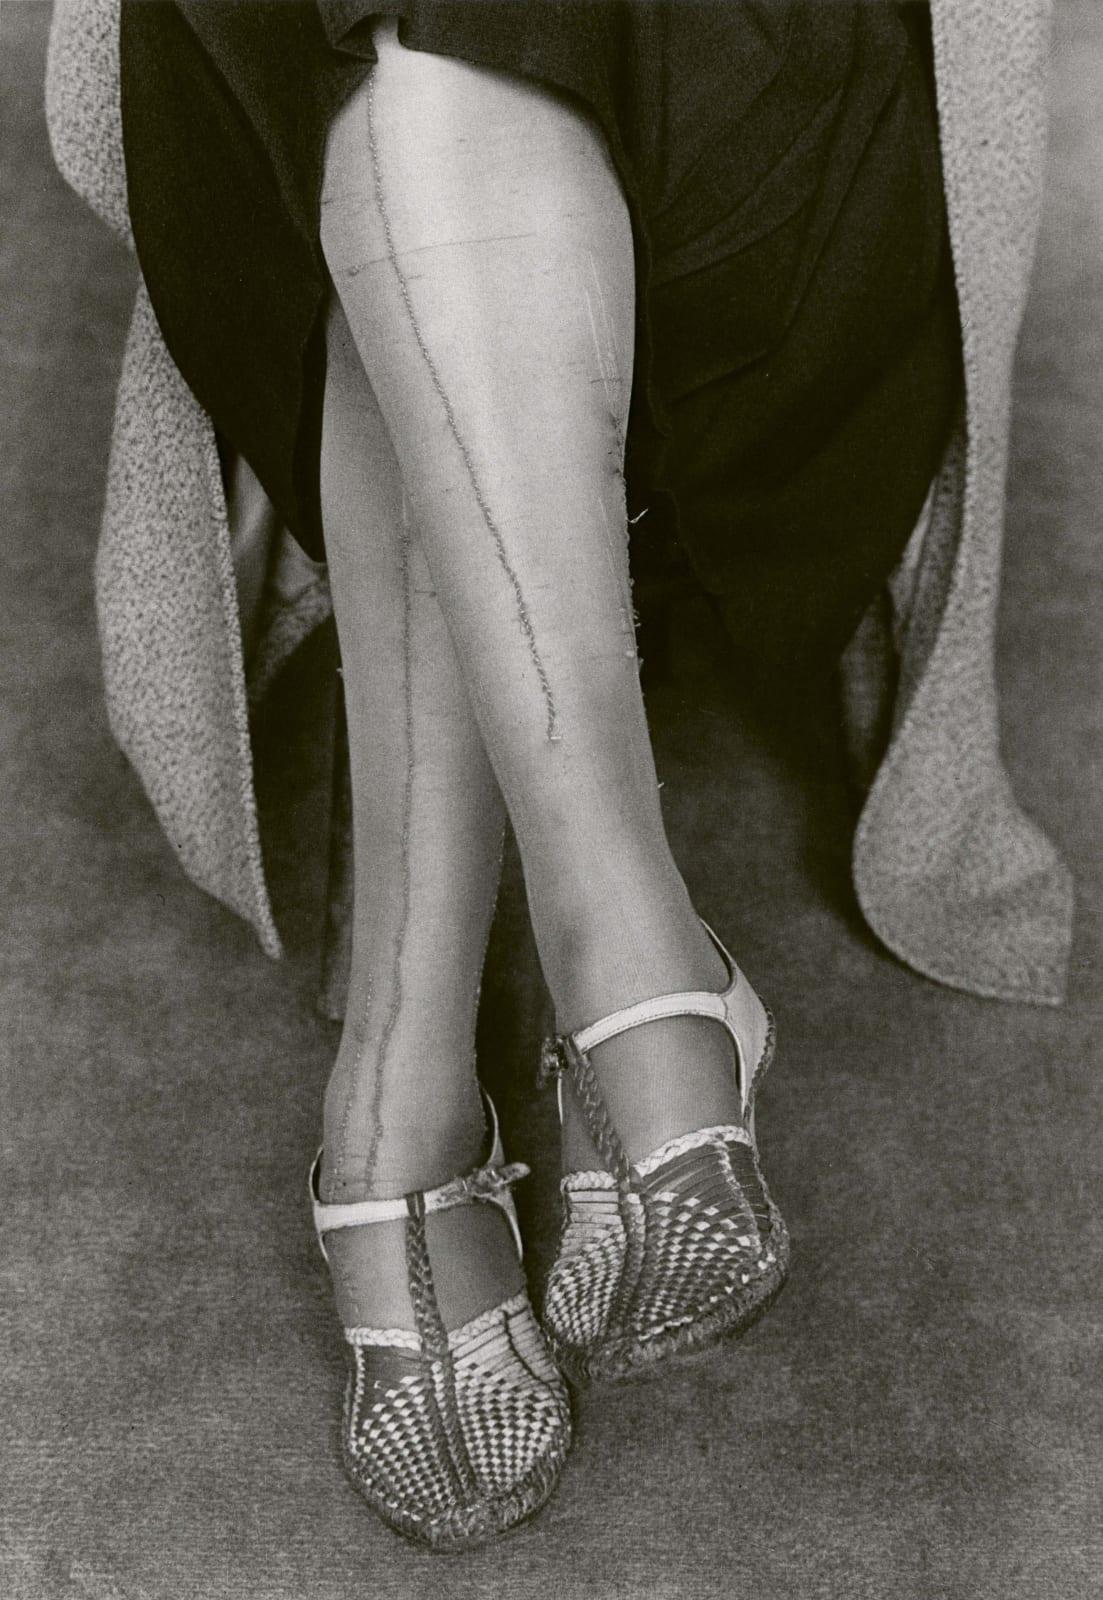 Dorothea Lange, Mended Stockings, San Francisco, 1934